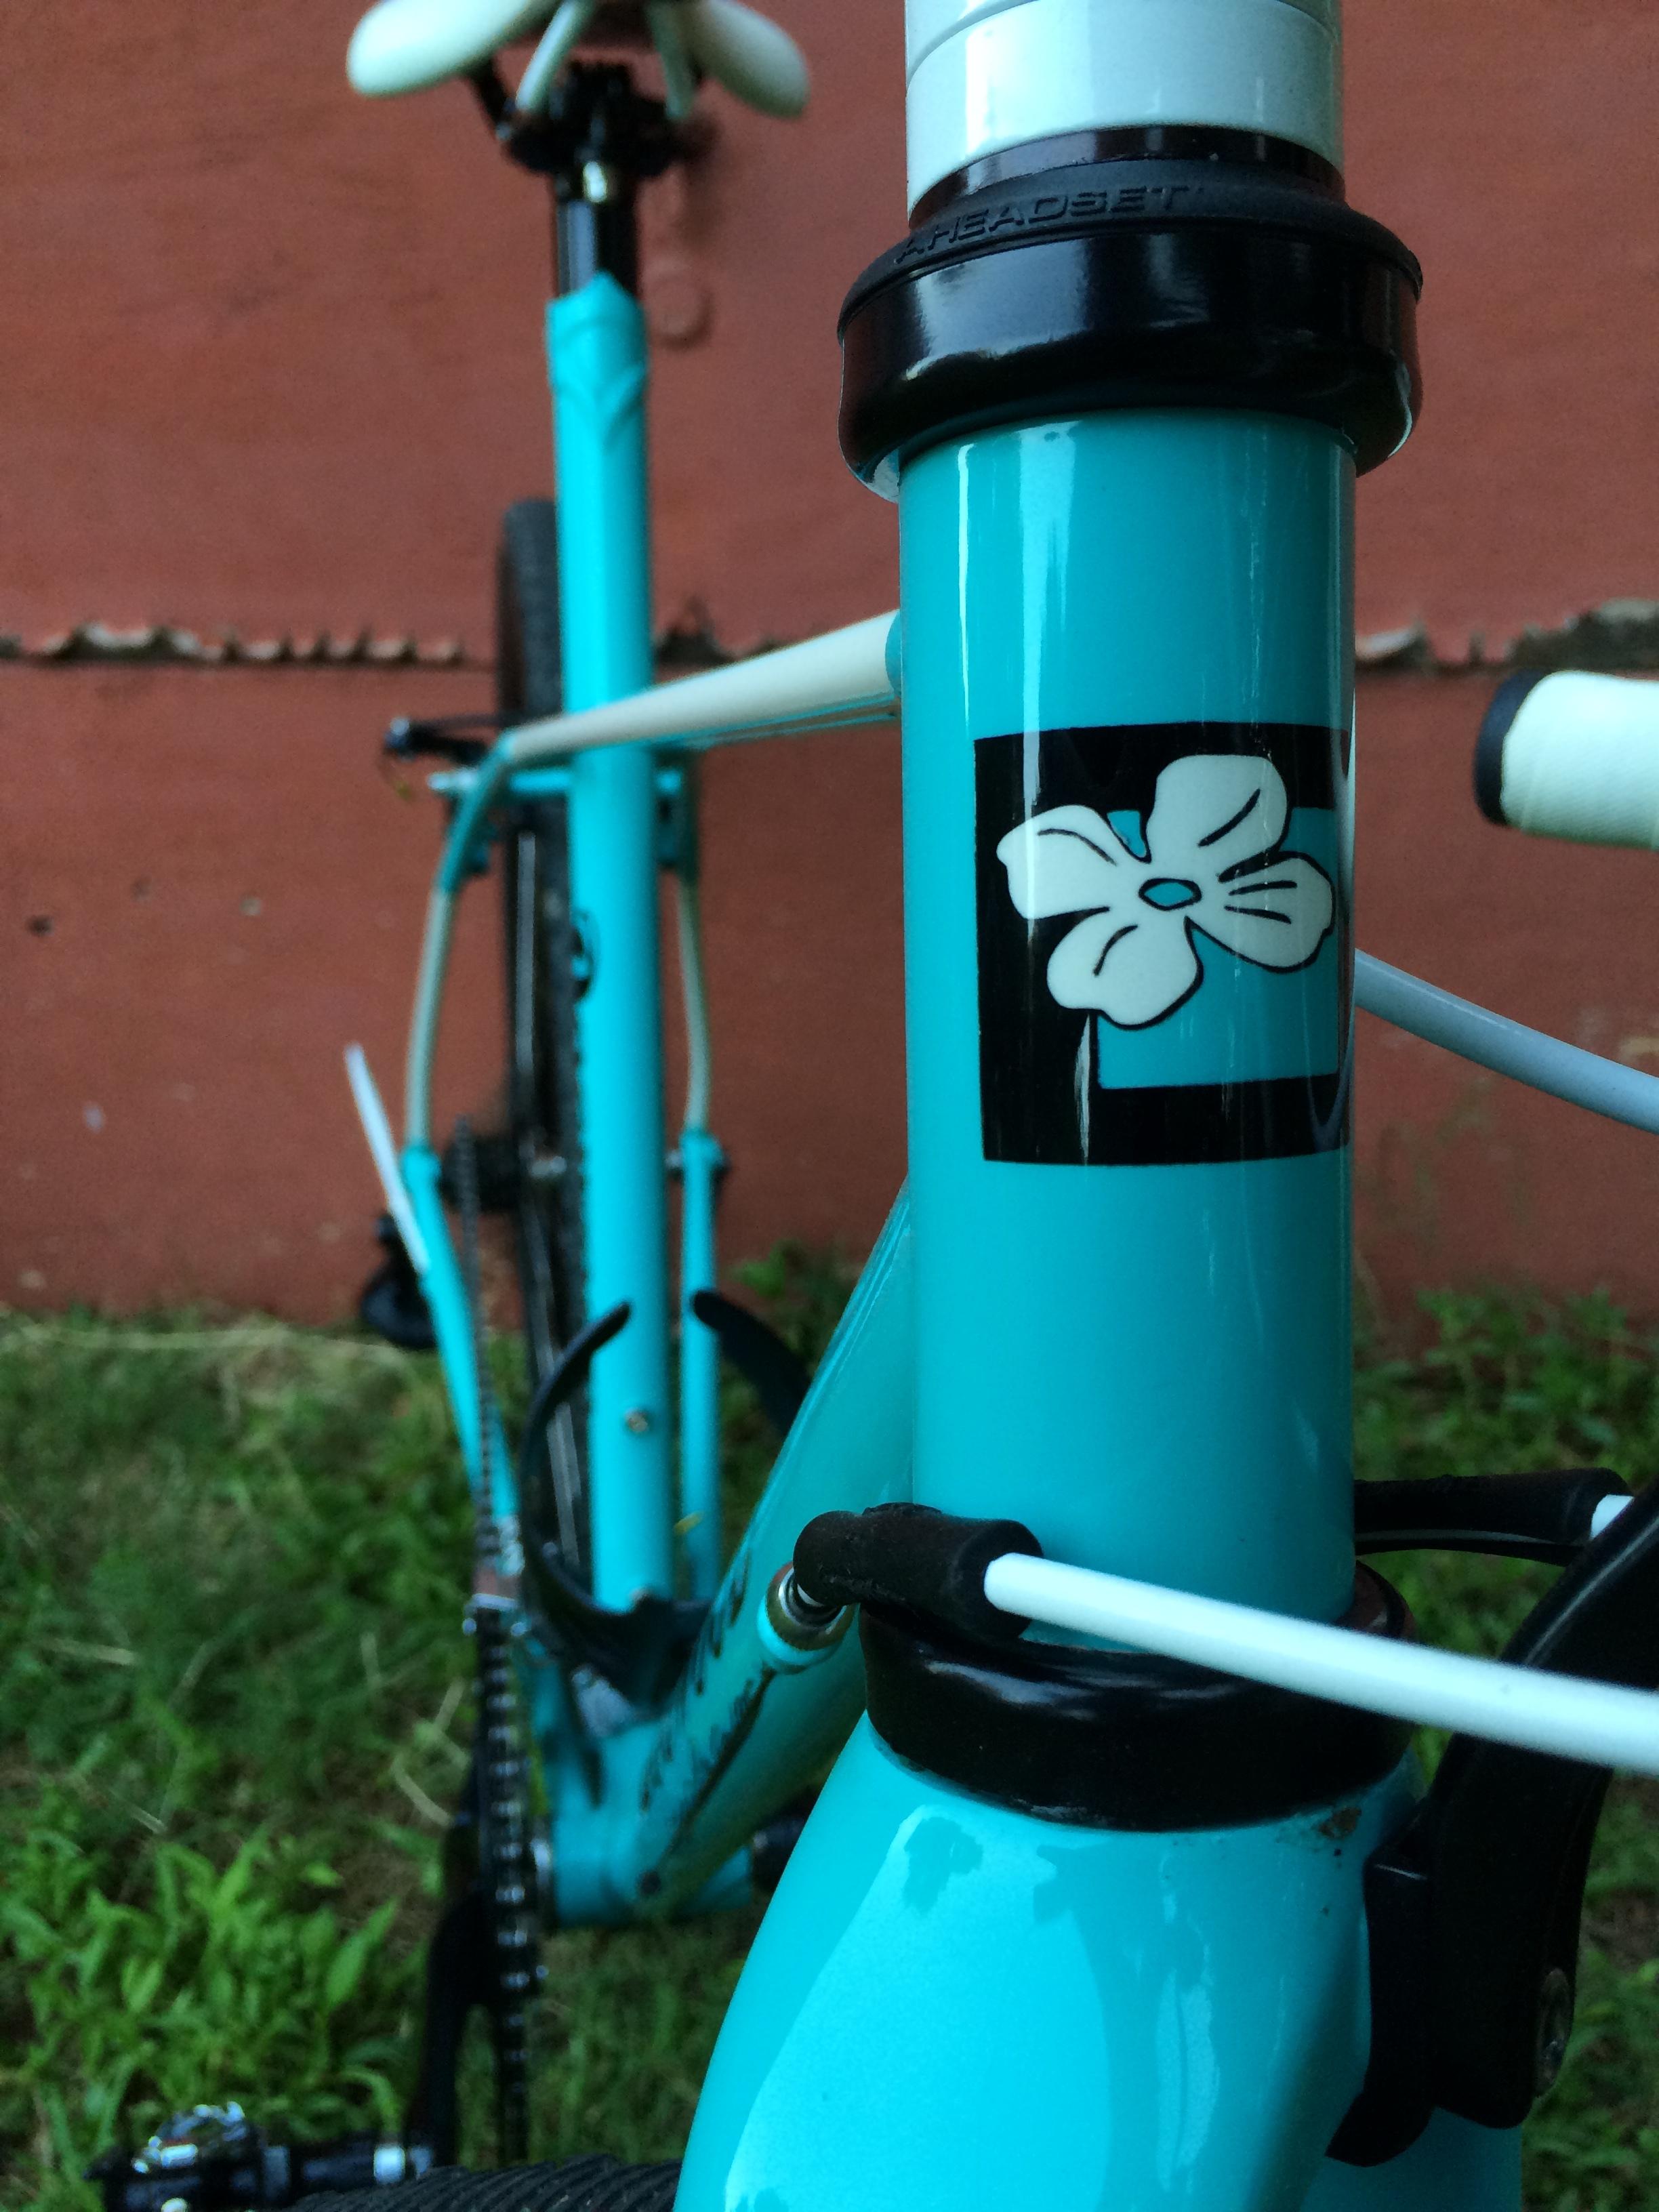 Dogwood-cycleworx-steel-custom-bicycle-columbus-tubing-cyclo-cross-12.jpg